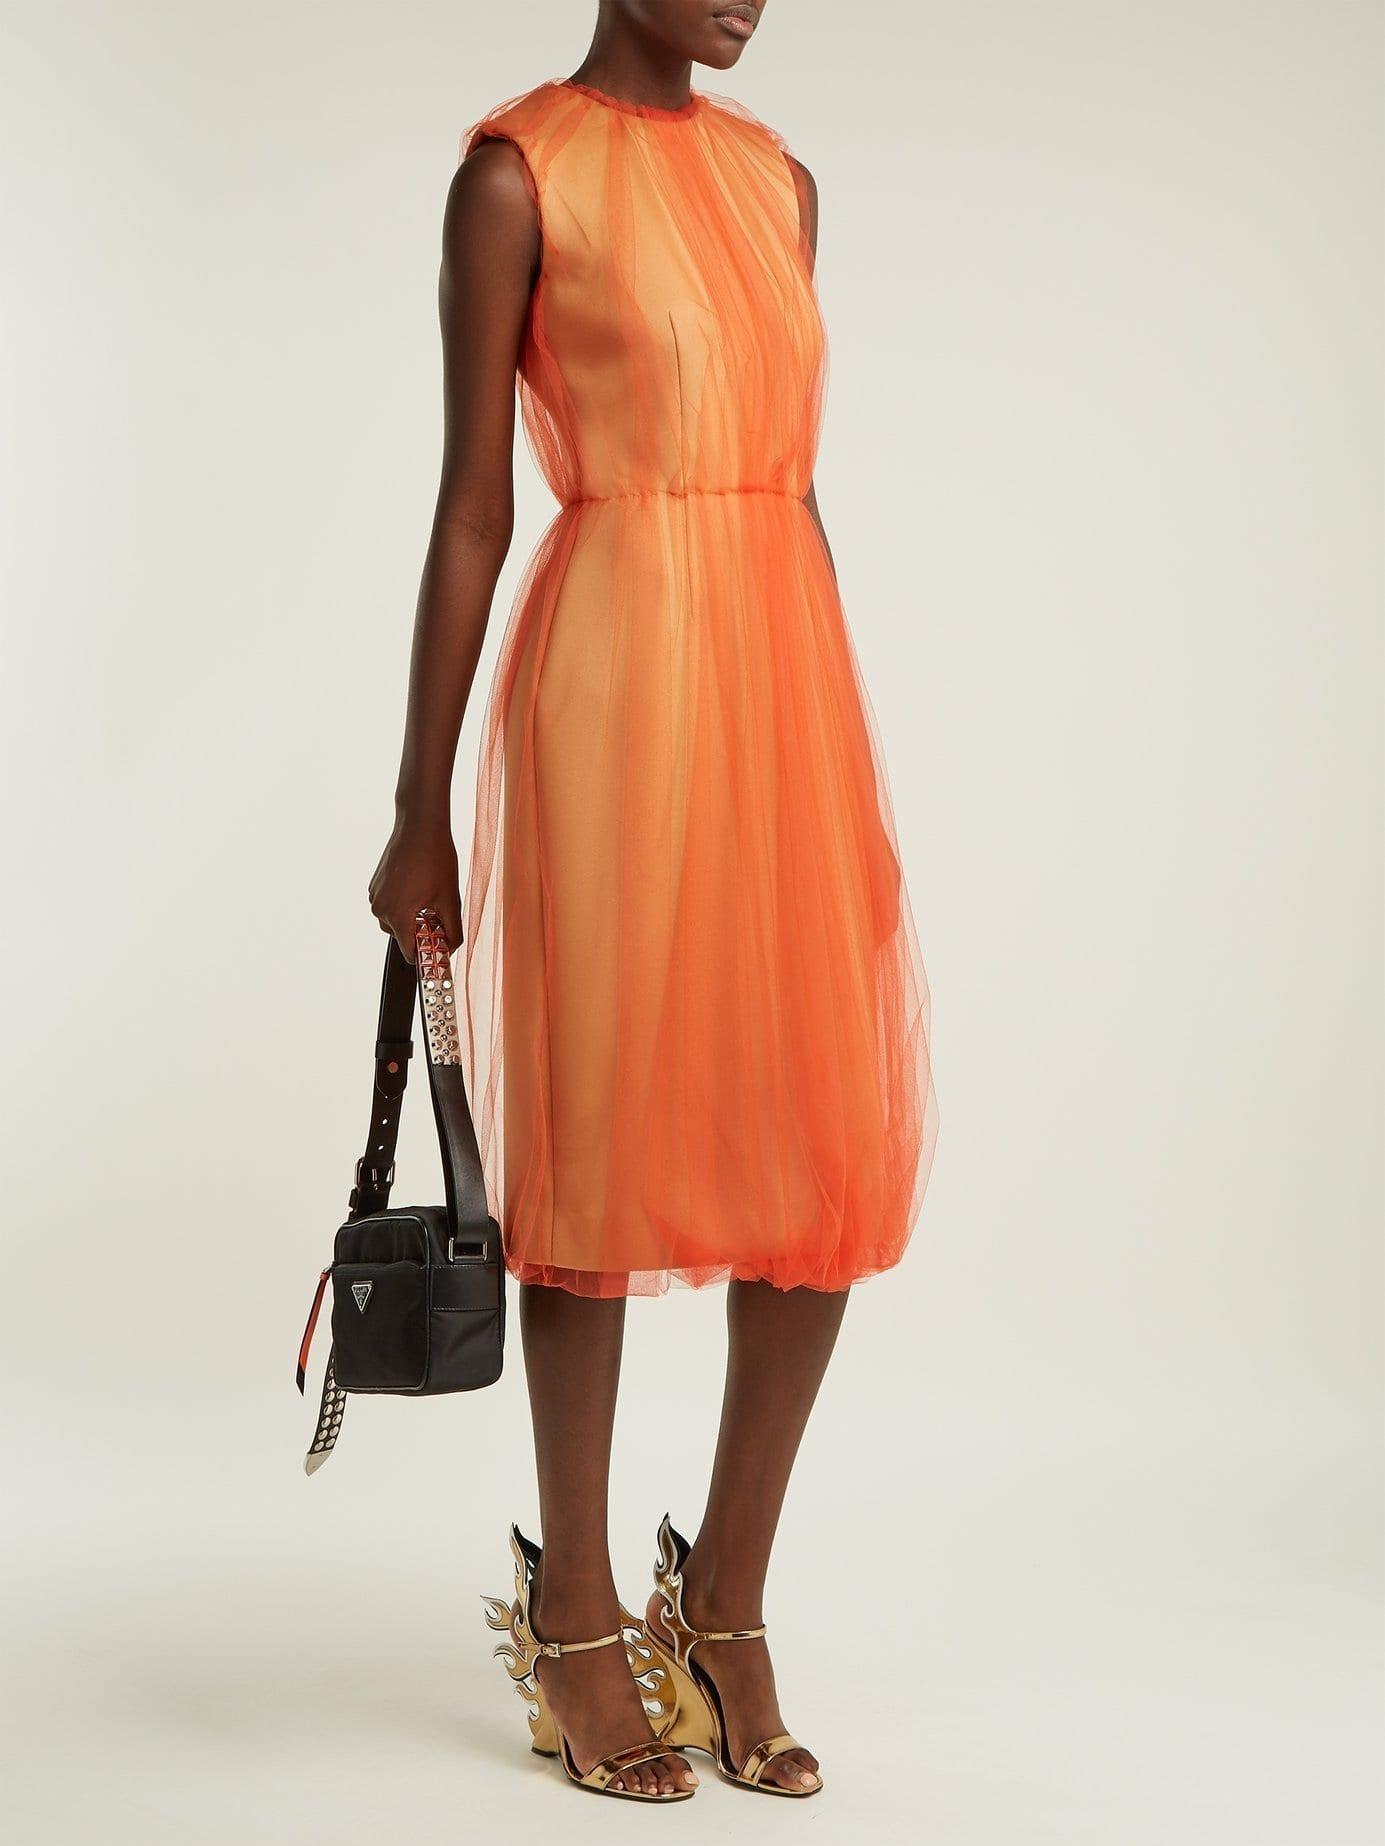 PRADA Jersey And Tulle Sleeveless Orange Dress